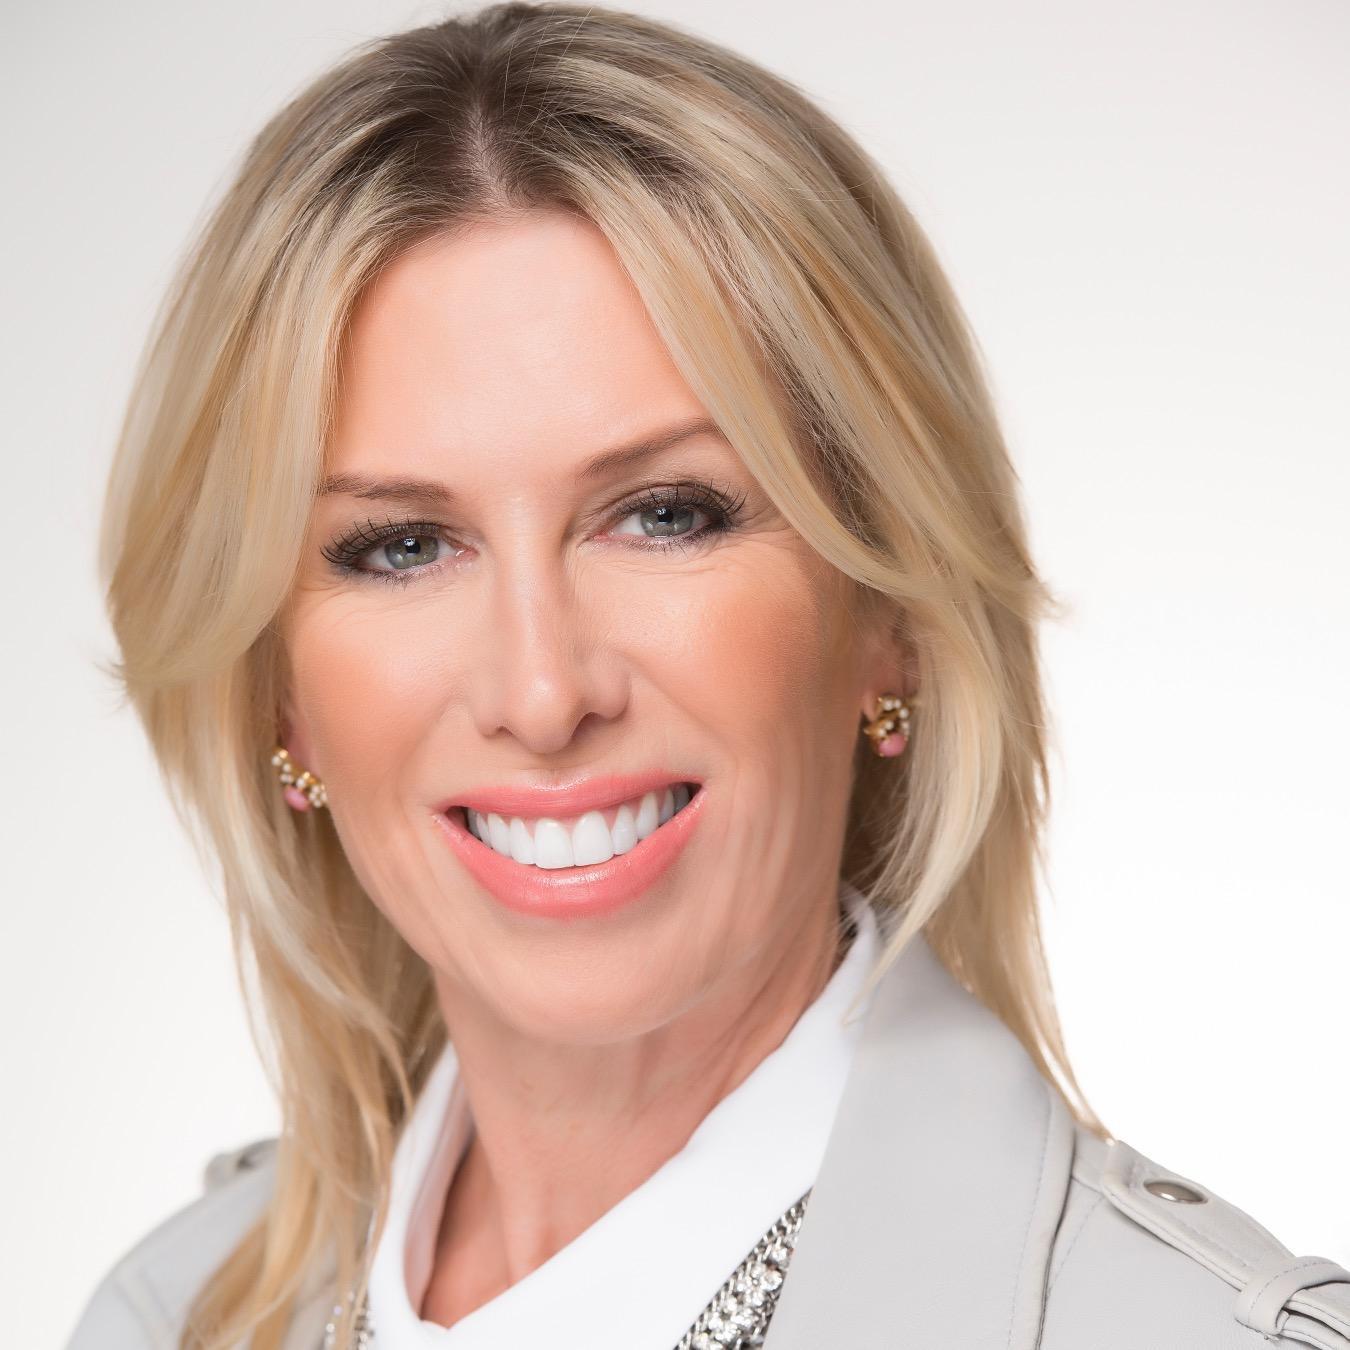 Sharon Cooper - Sales Representative, Commercial Sales & Leasing,The Behar Group Realty Inc., Brokerage